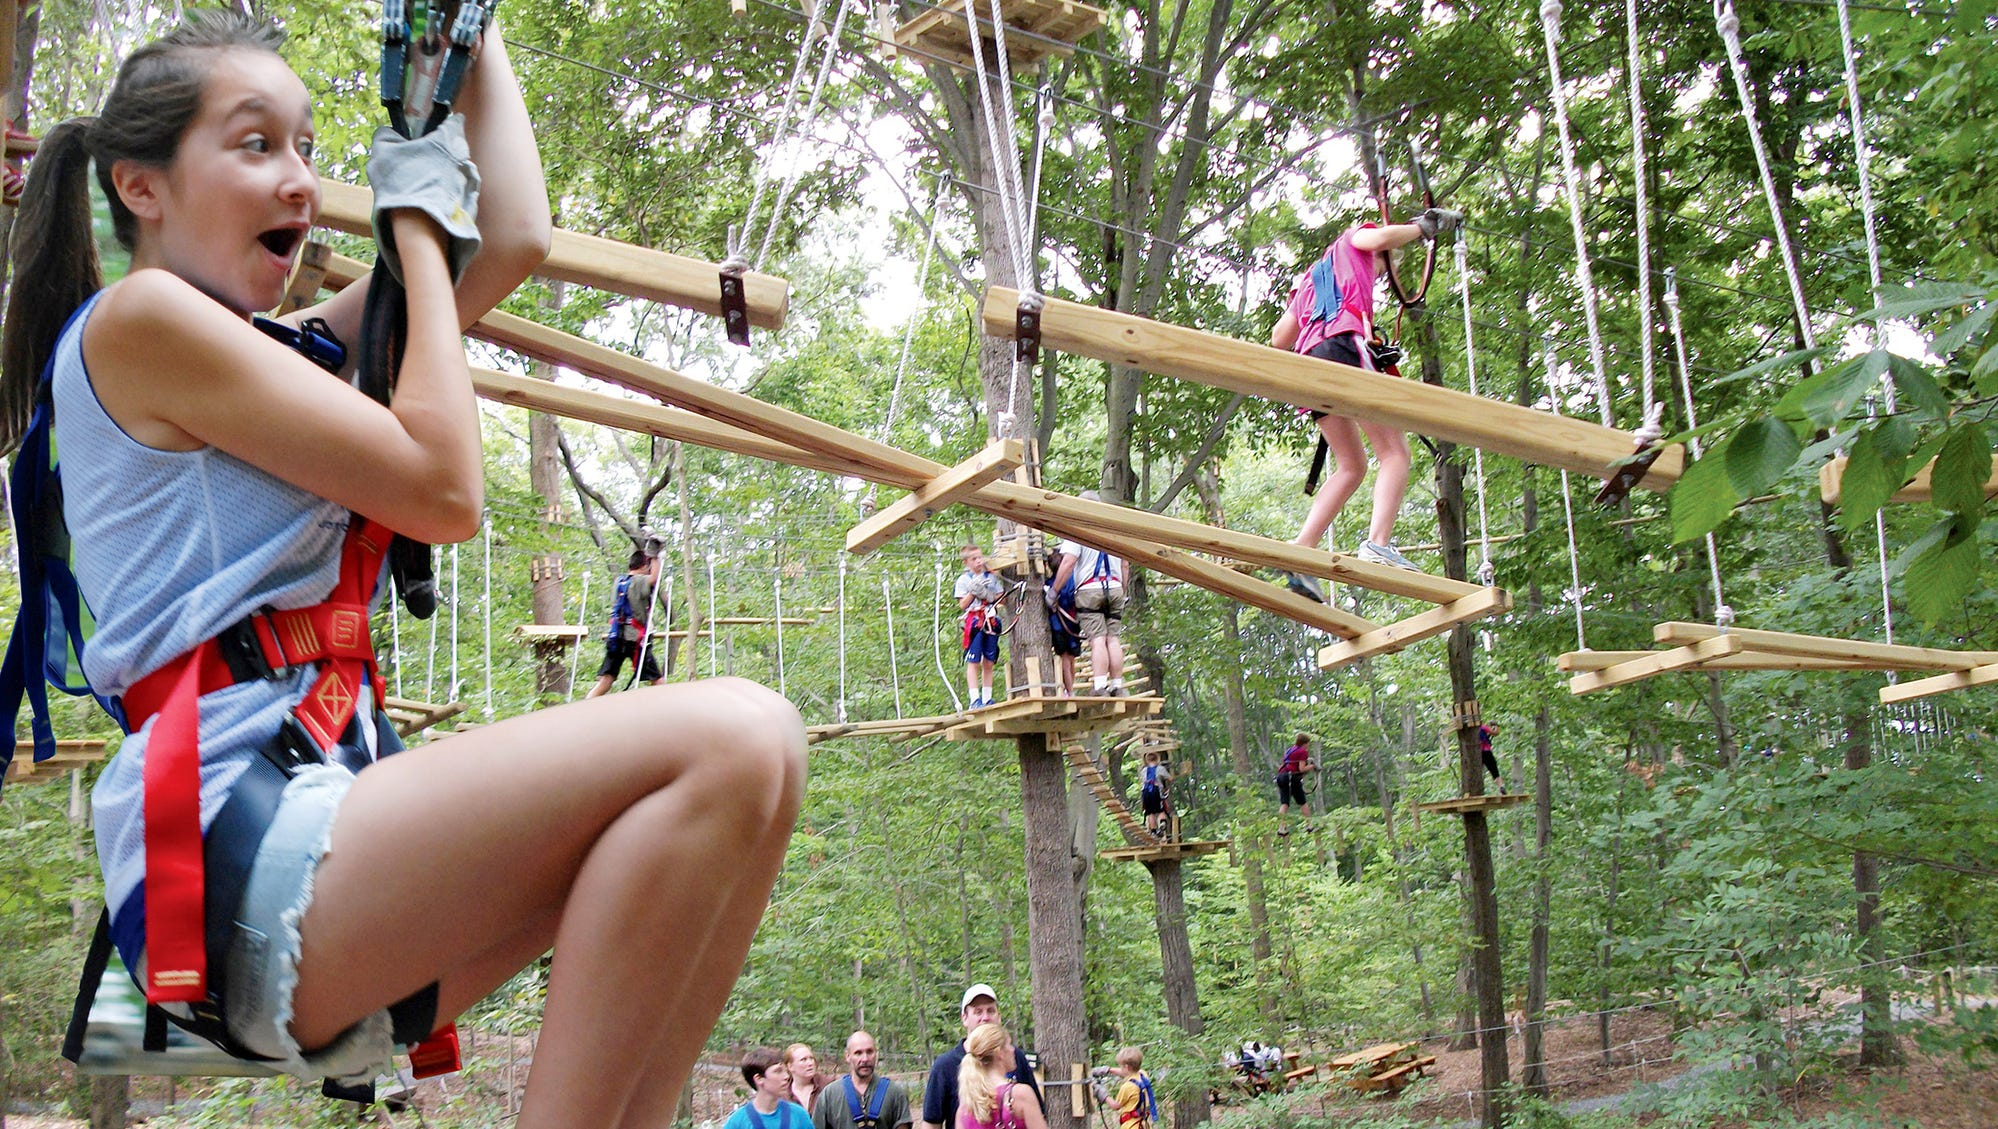 Zip line park, Adventure Park at Nashville, opening in West Meade